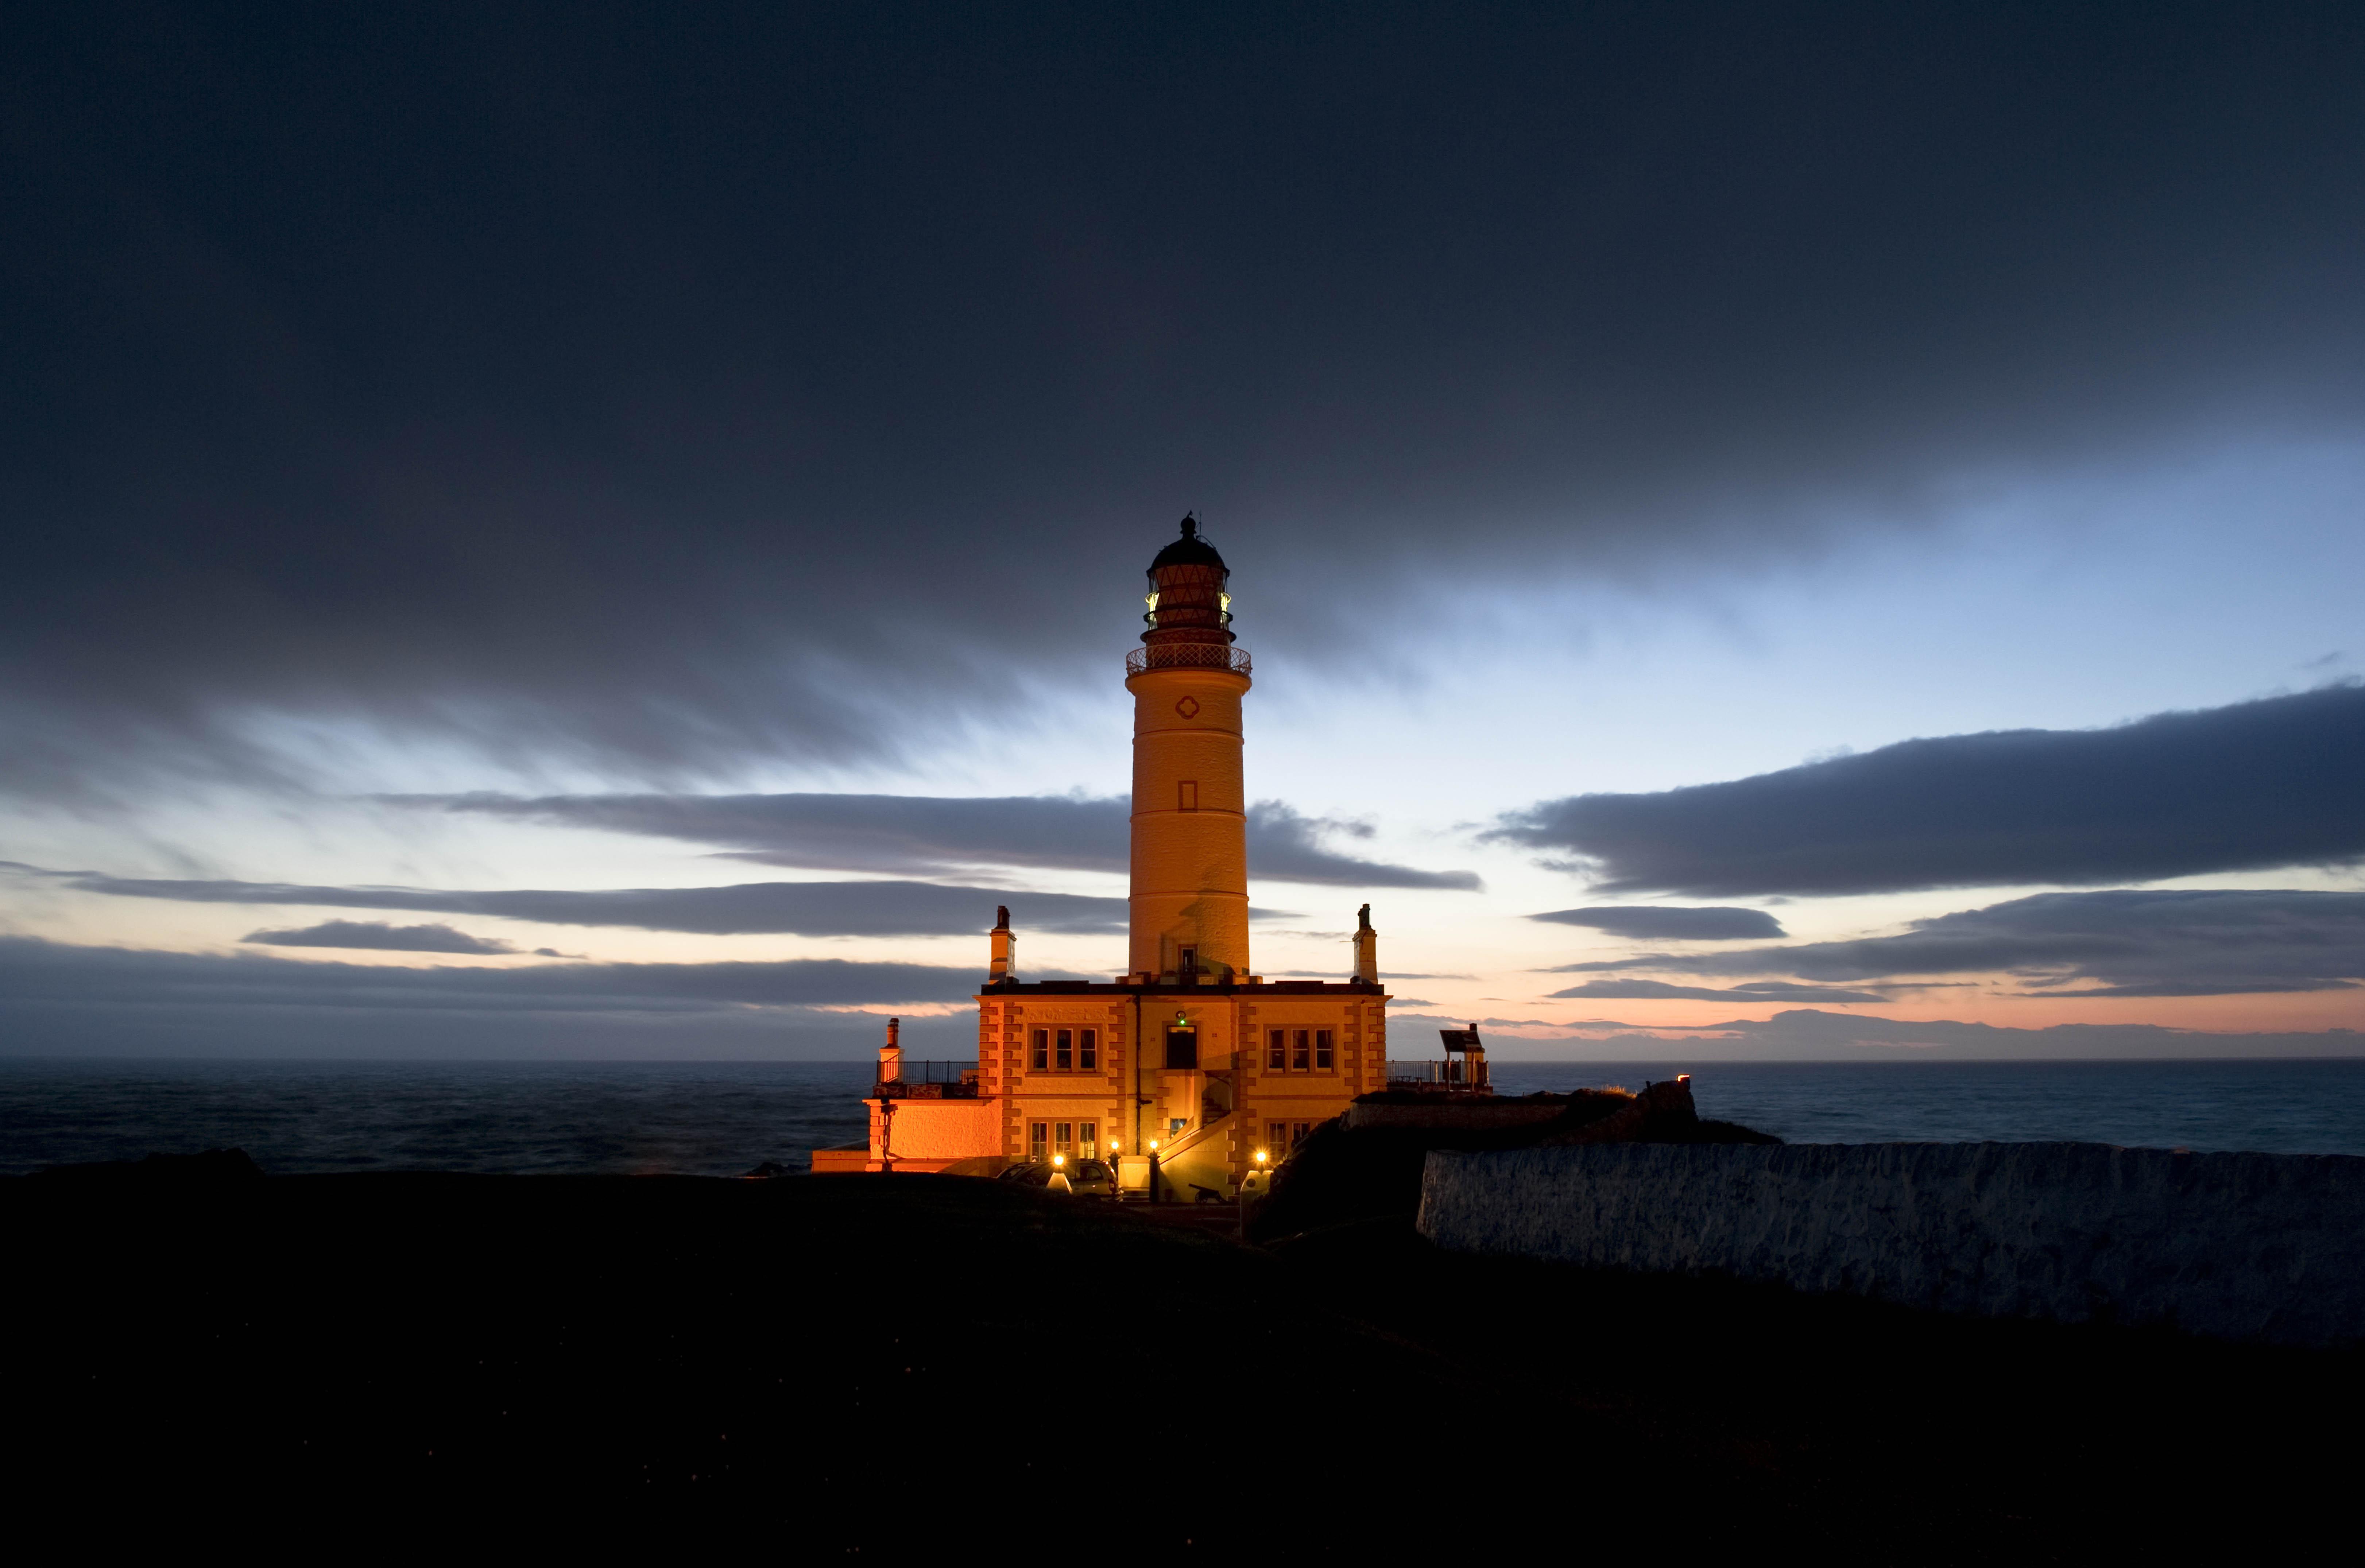 Corsewall Lighthouse, GB-SCT ©Johannes Ratermann